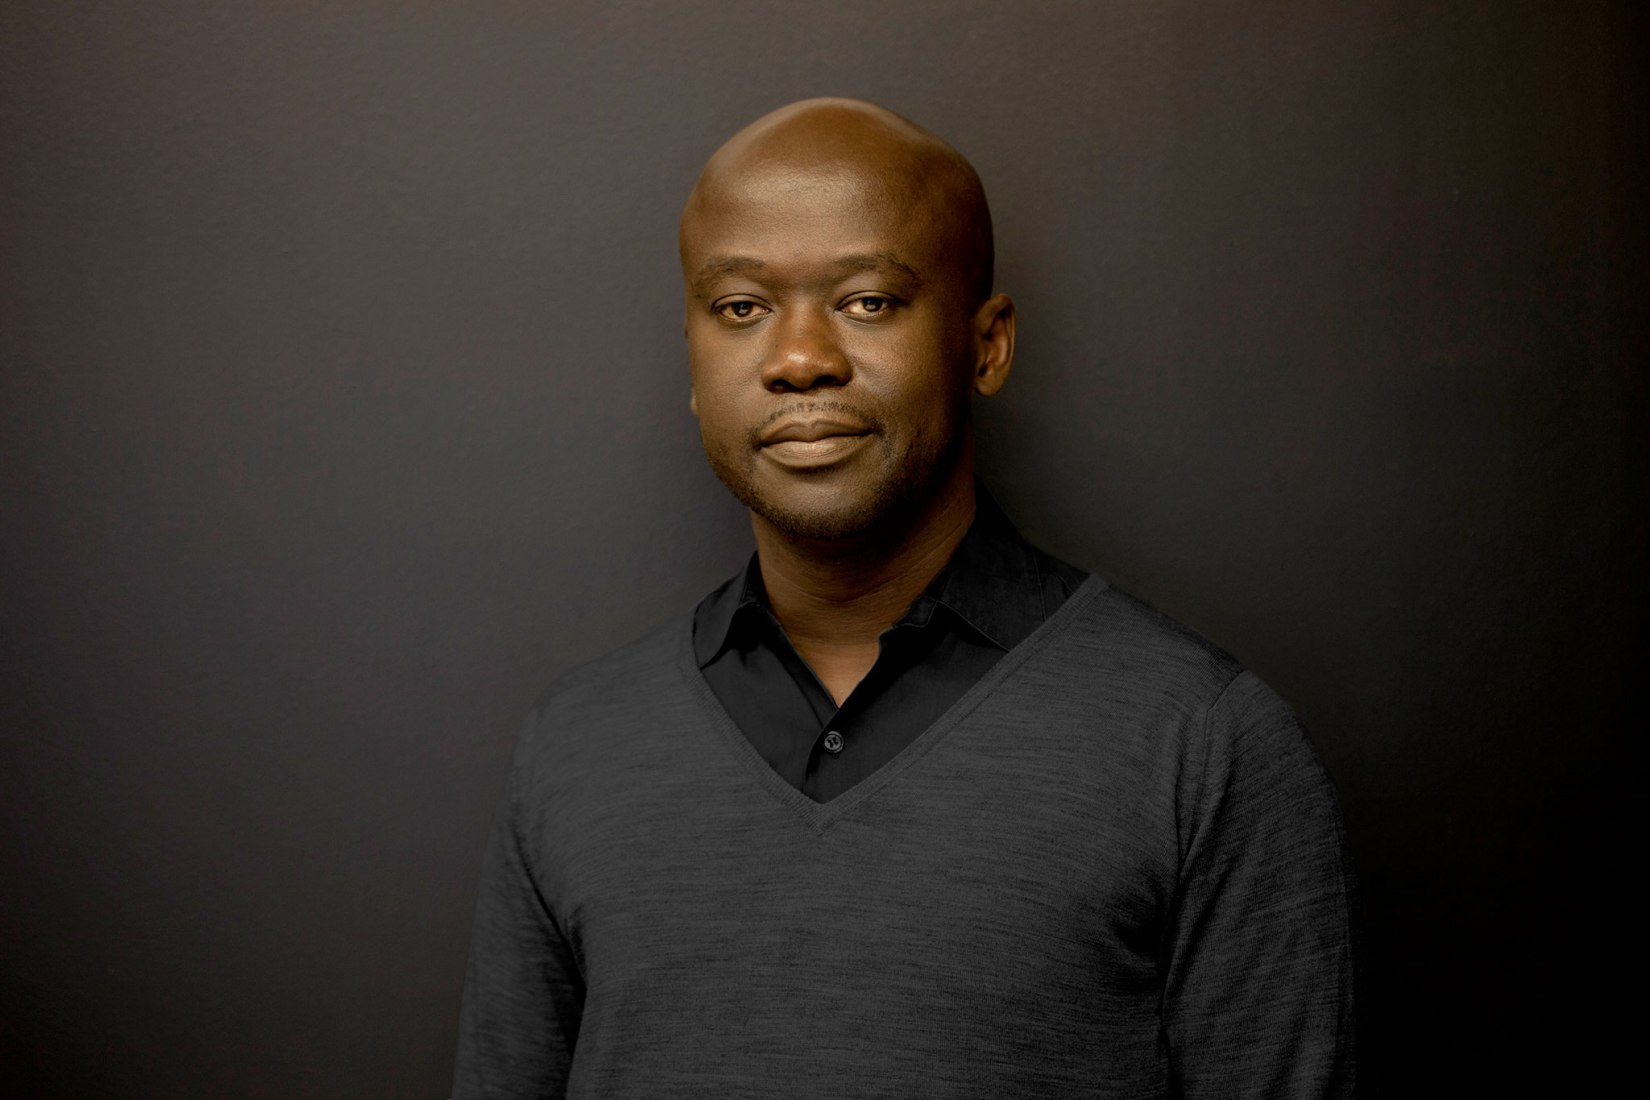 David Adjaye. Photograph by Ed Reeve